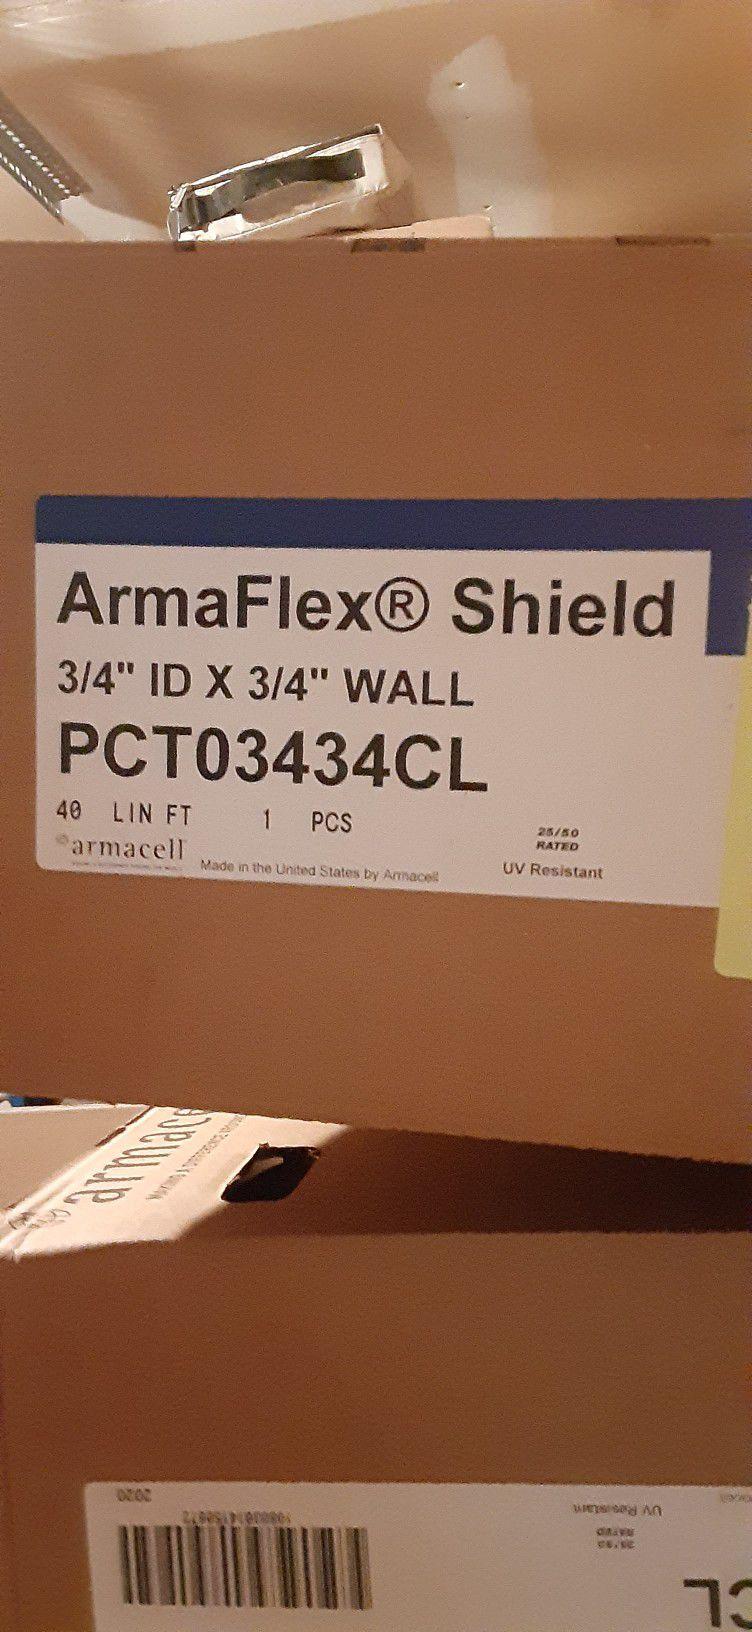 "Armaflex Pipe Wrap Insulation 3/4"" 800 feet"